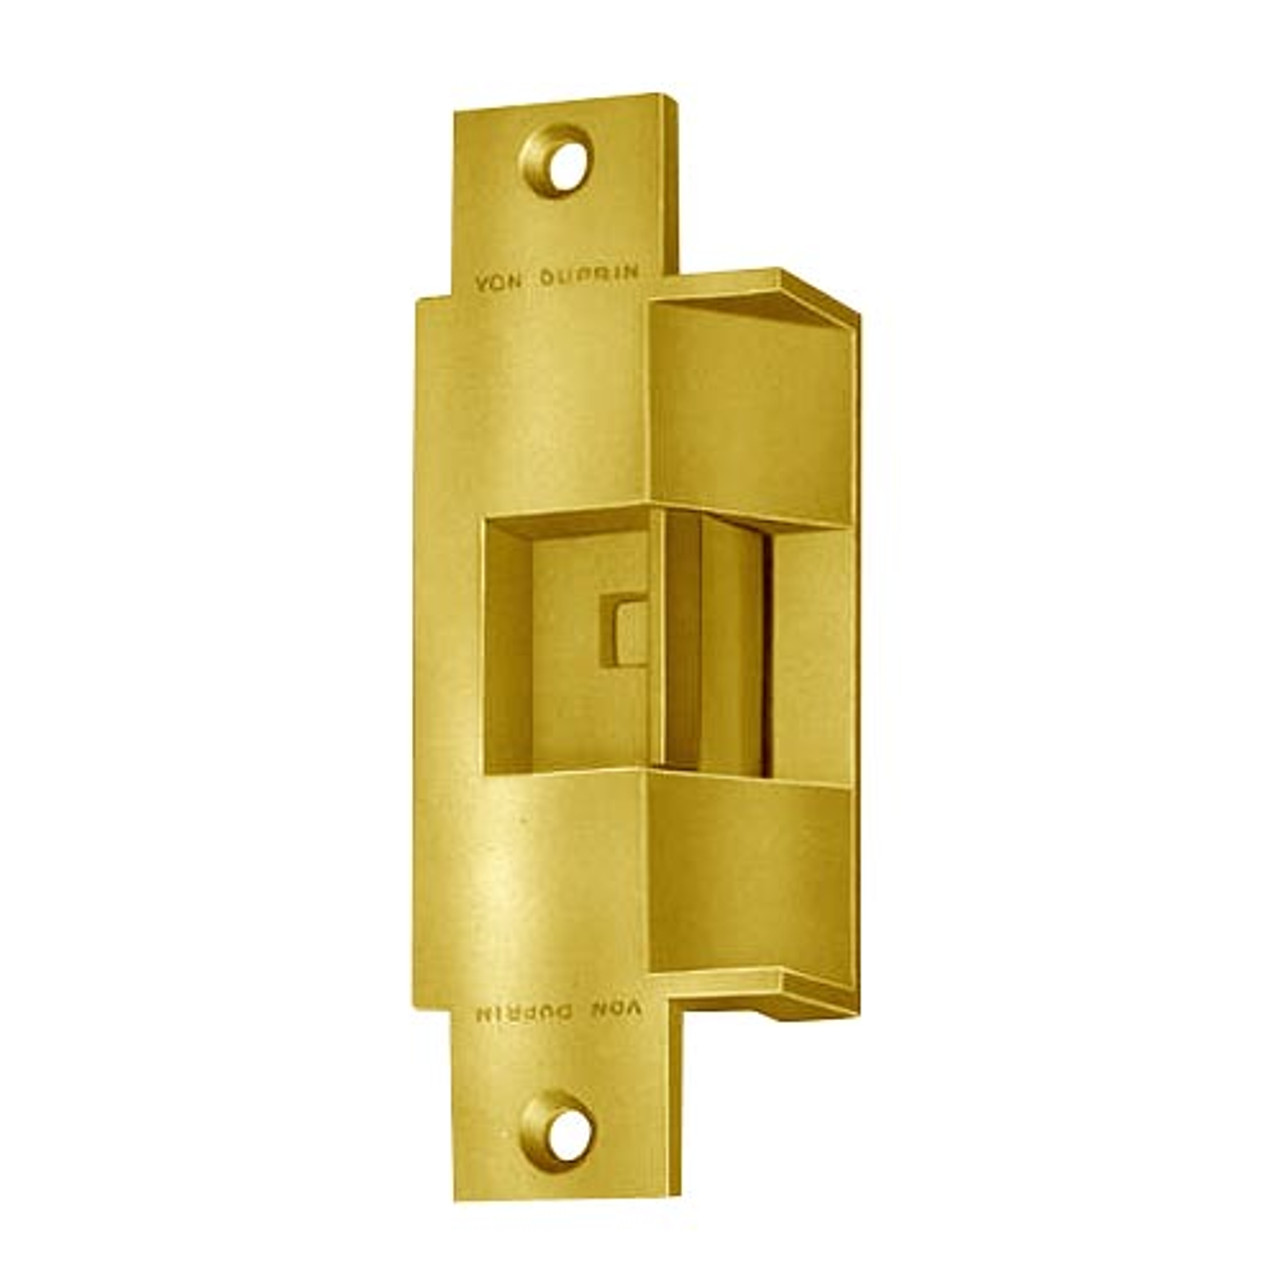 6213-FS-DS-LC-12VDC-US3 Von Duprin Electric Strike in Bright Brass Finish